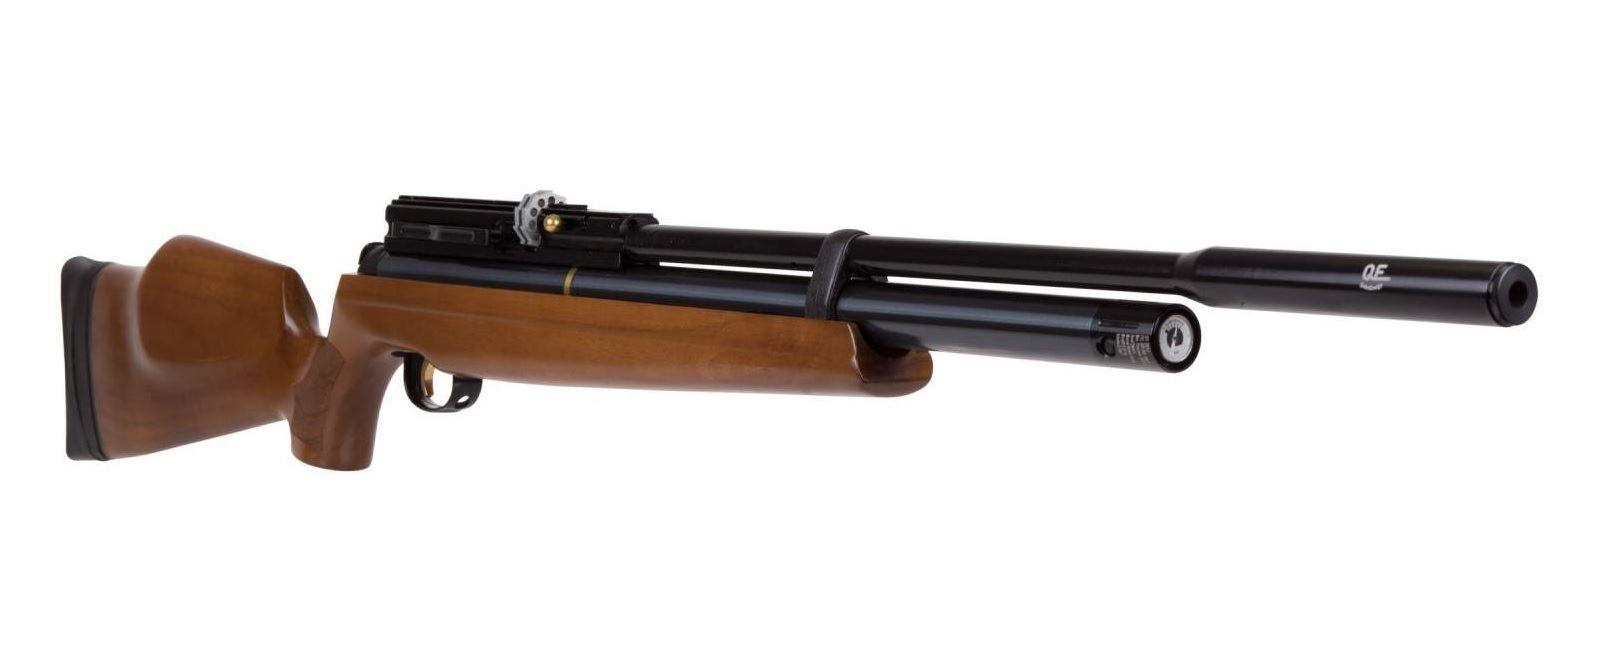 PCP Hatsan W10 QE New Various Long RifleWalnut AT44 Stock Air RSLc3Aq54j